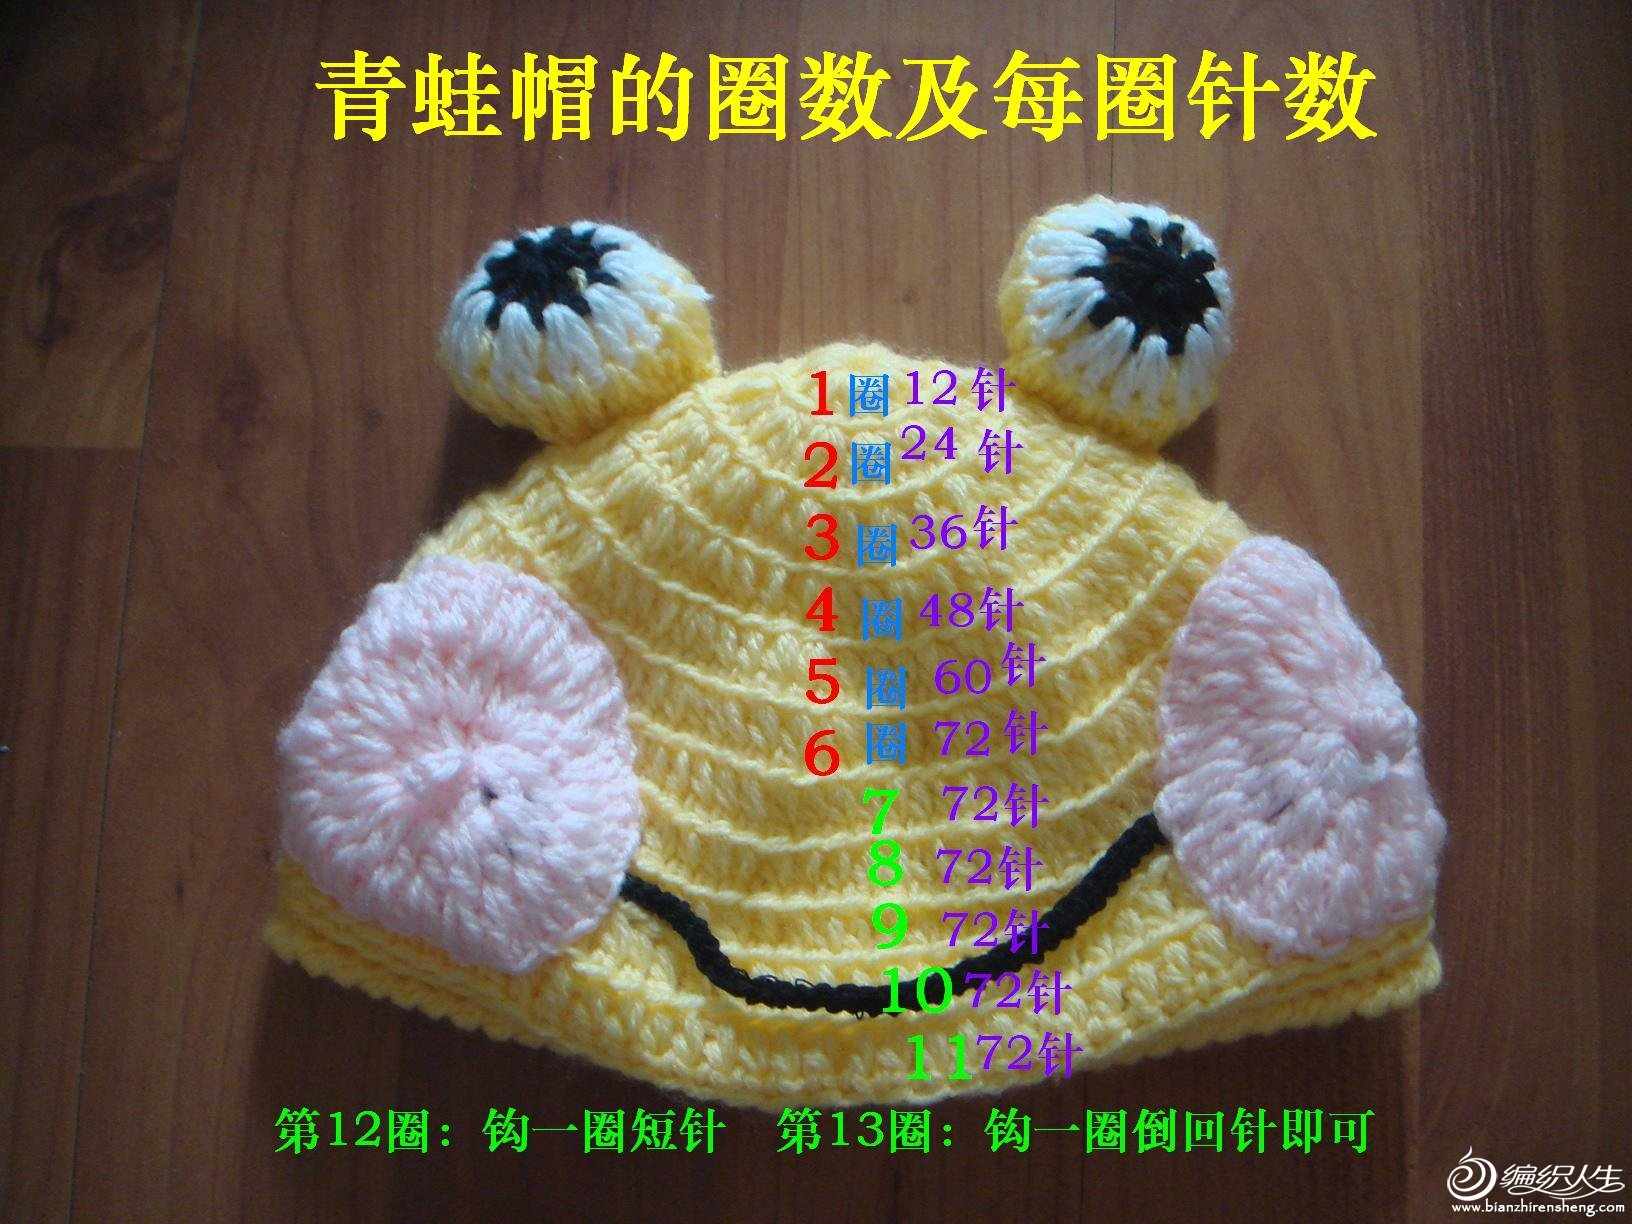 DSC08613.JPG